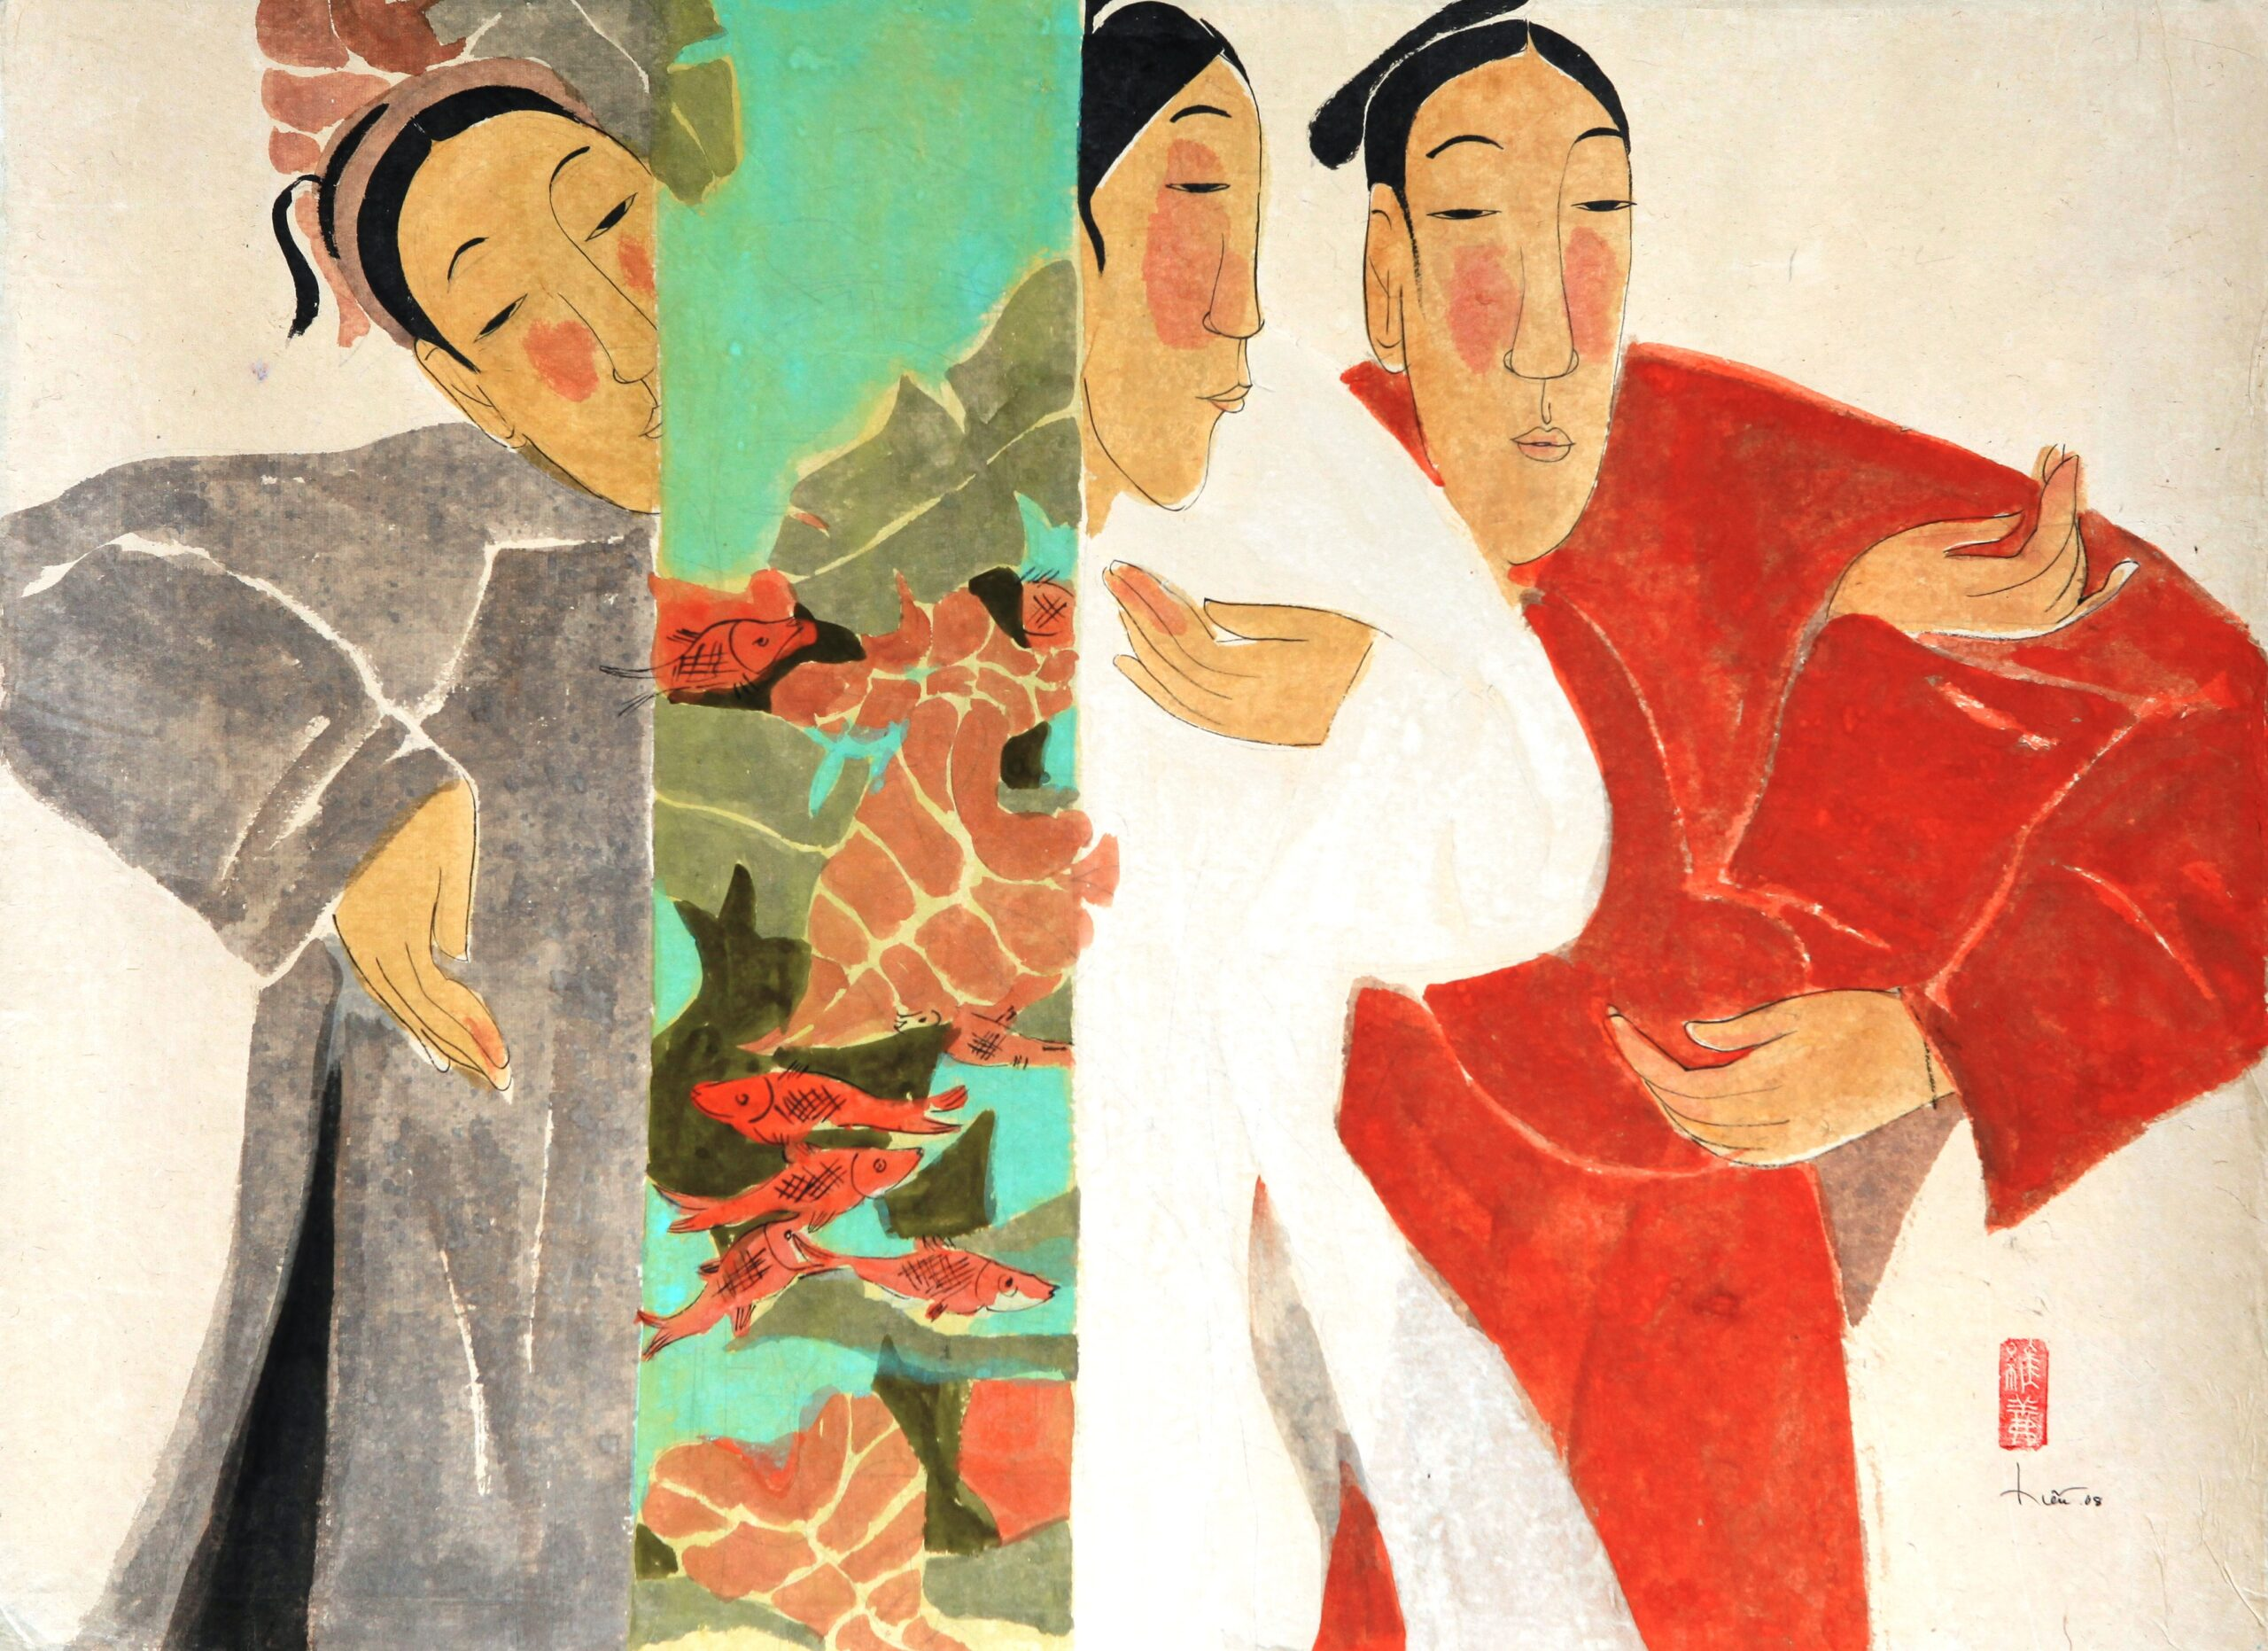 Springtime of Grace by Vu Thu Hien, watercolour on handmade paper, 2008, 60 x 80 cm